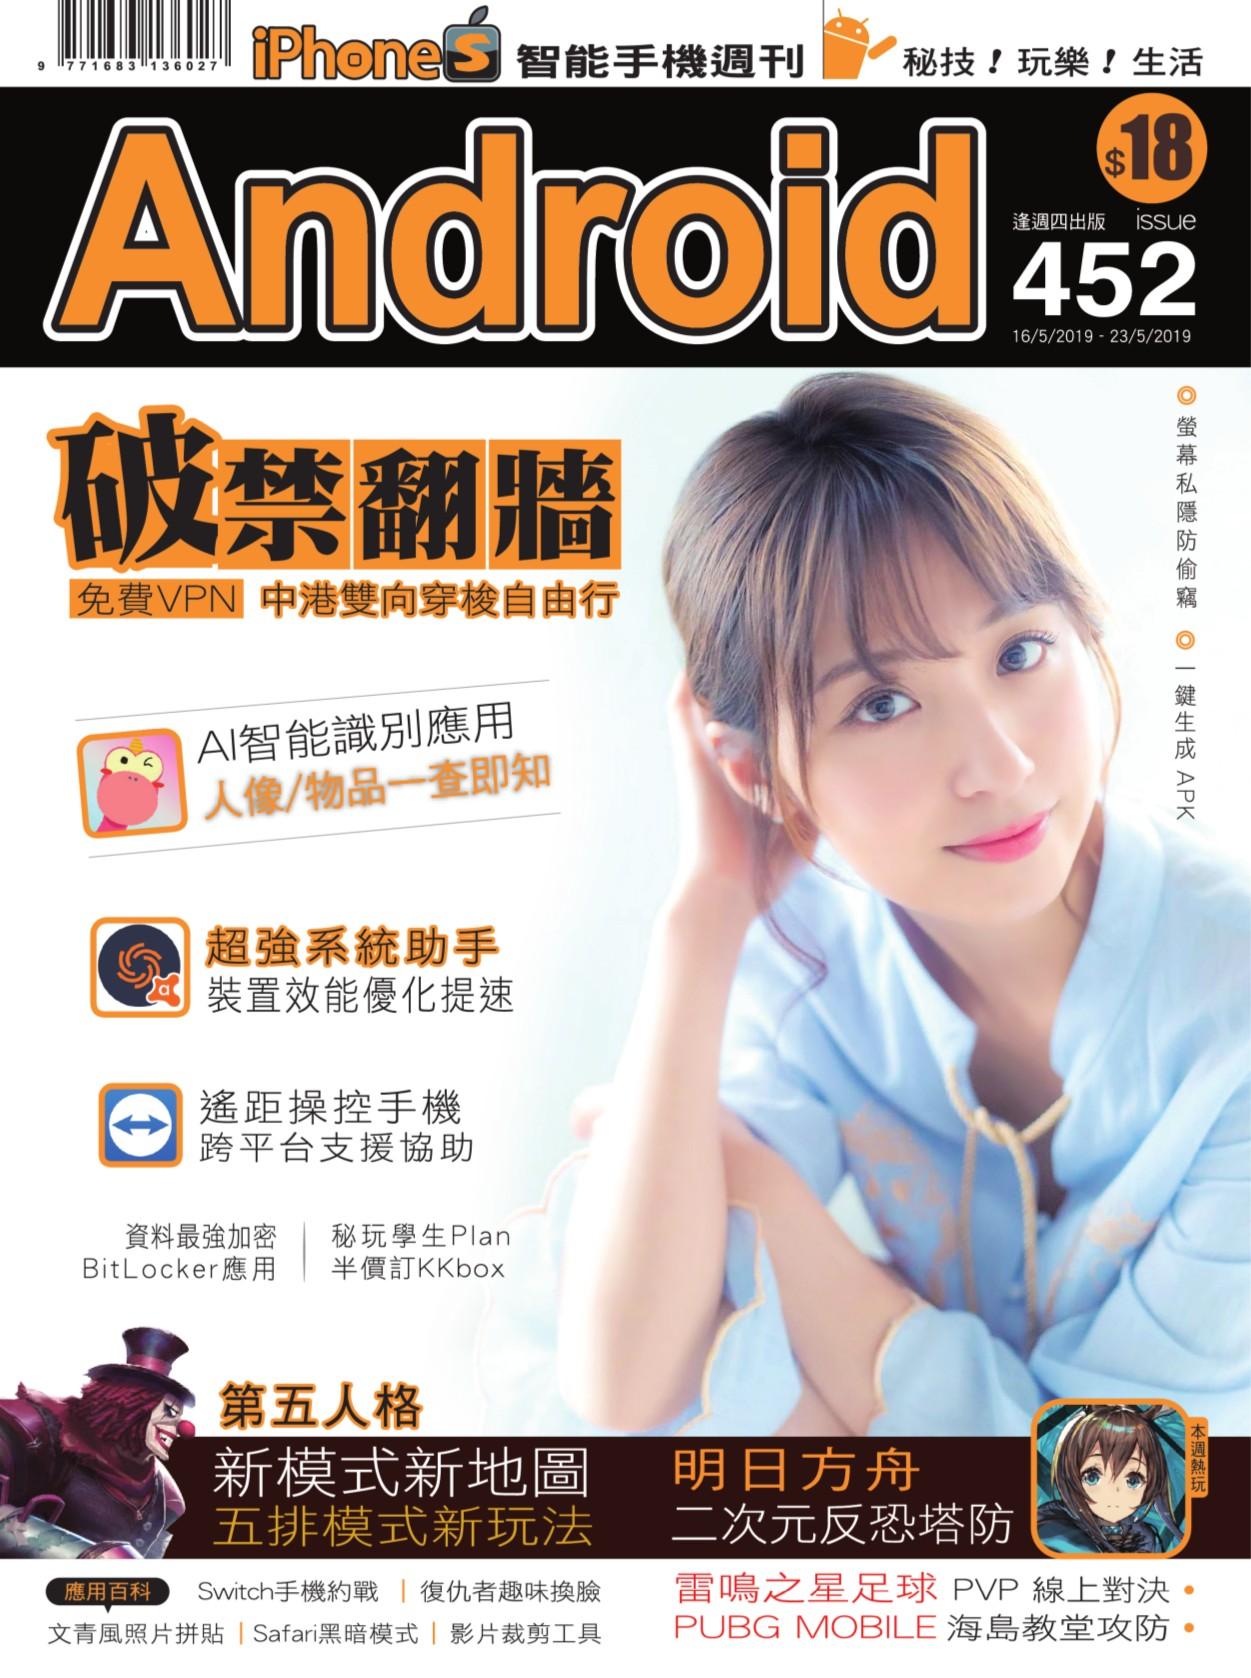 iPhoneS X Android 手机周刊2019年5月16日第452期